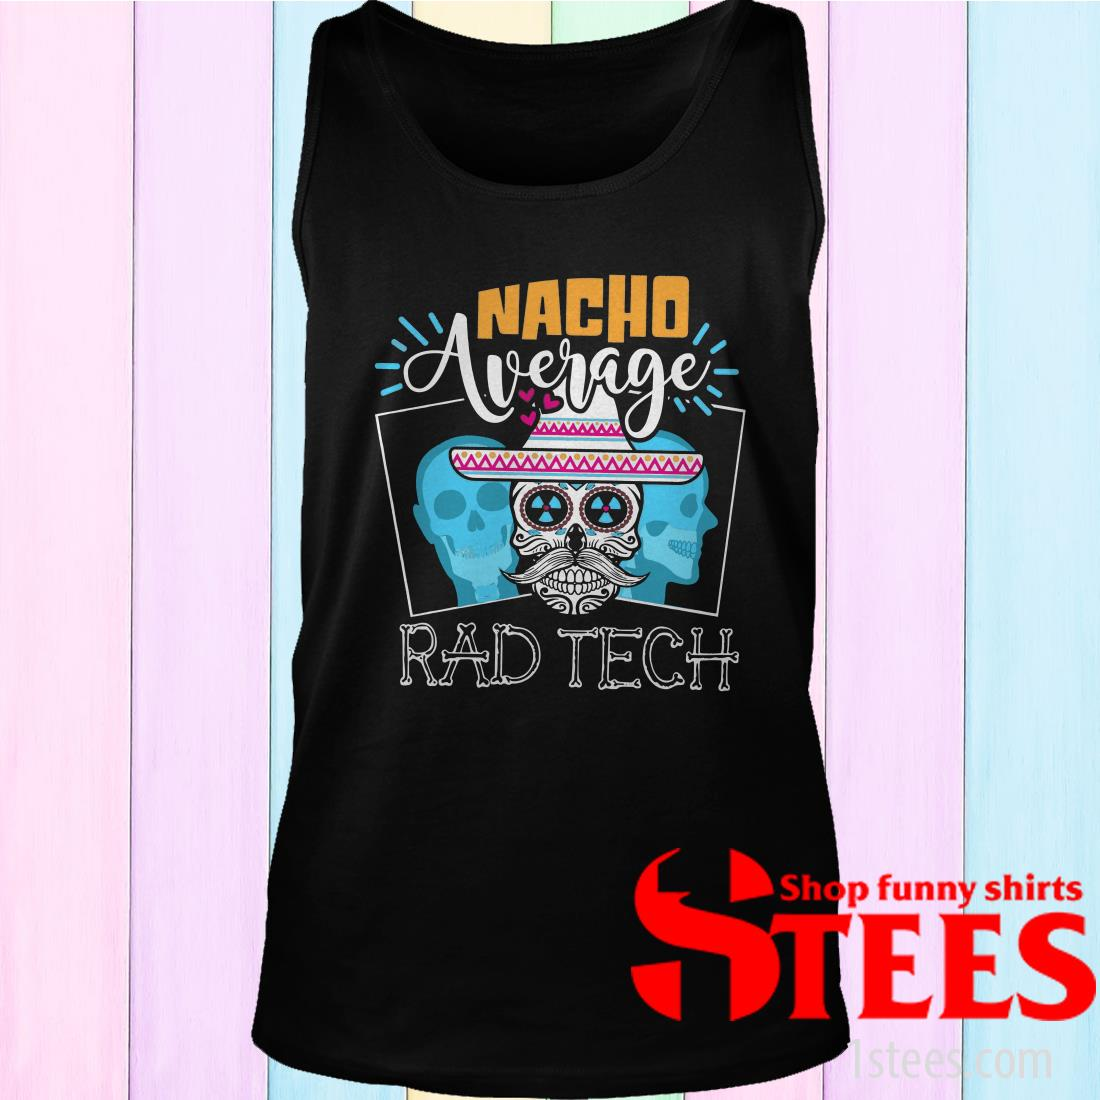 Nacho Average Rad Tech Shirt